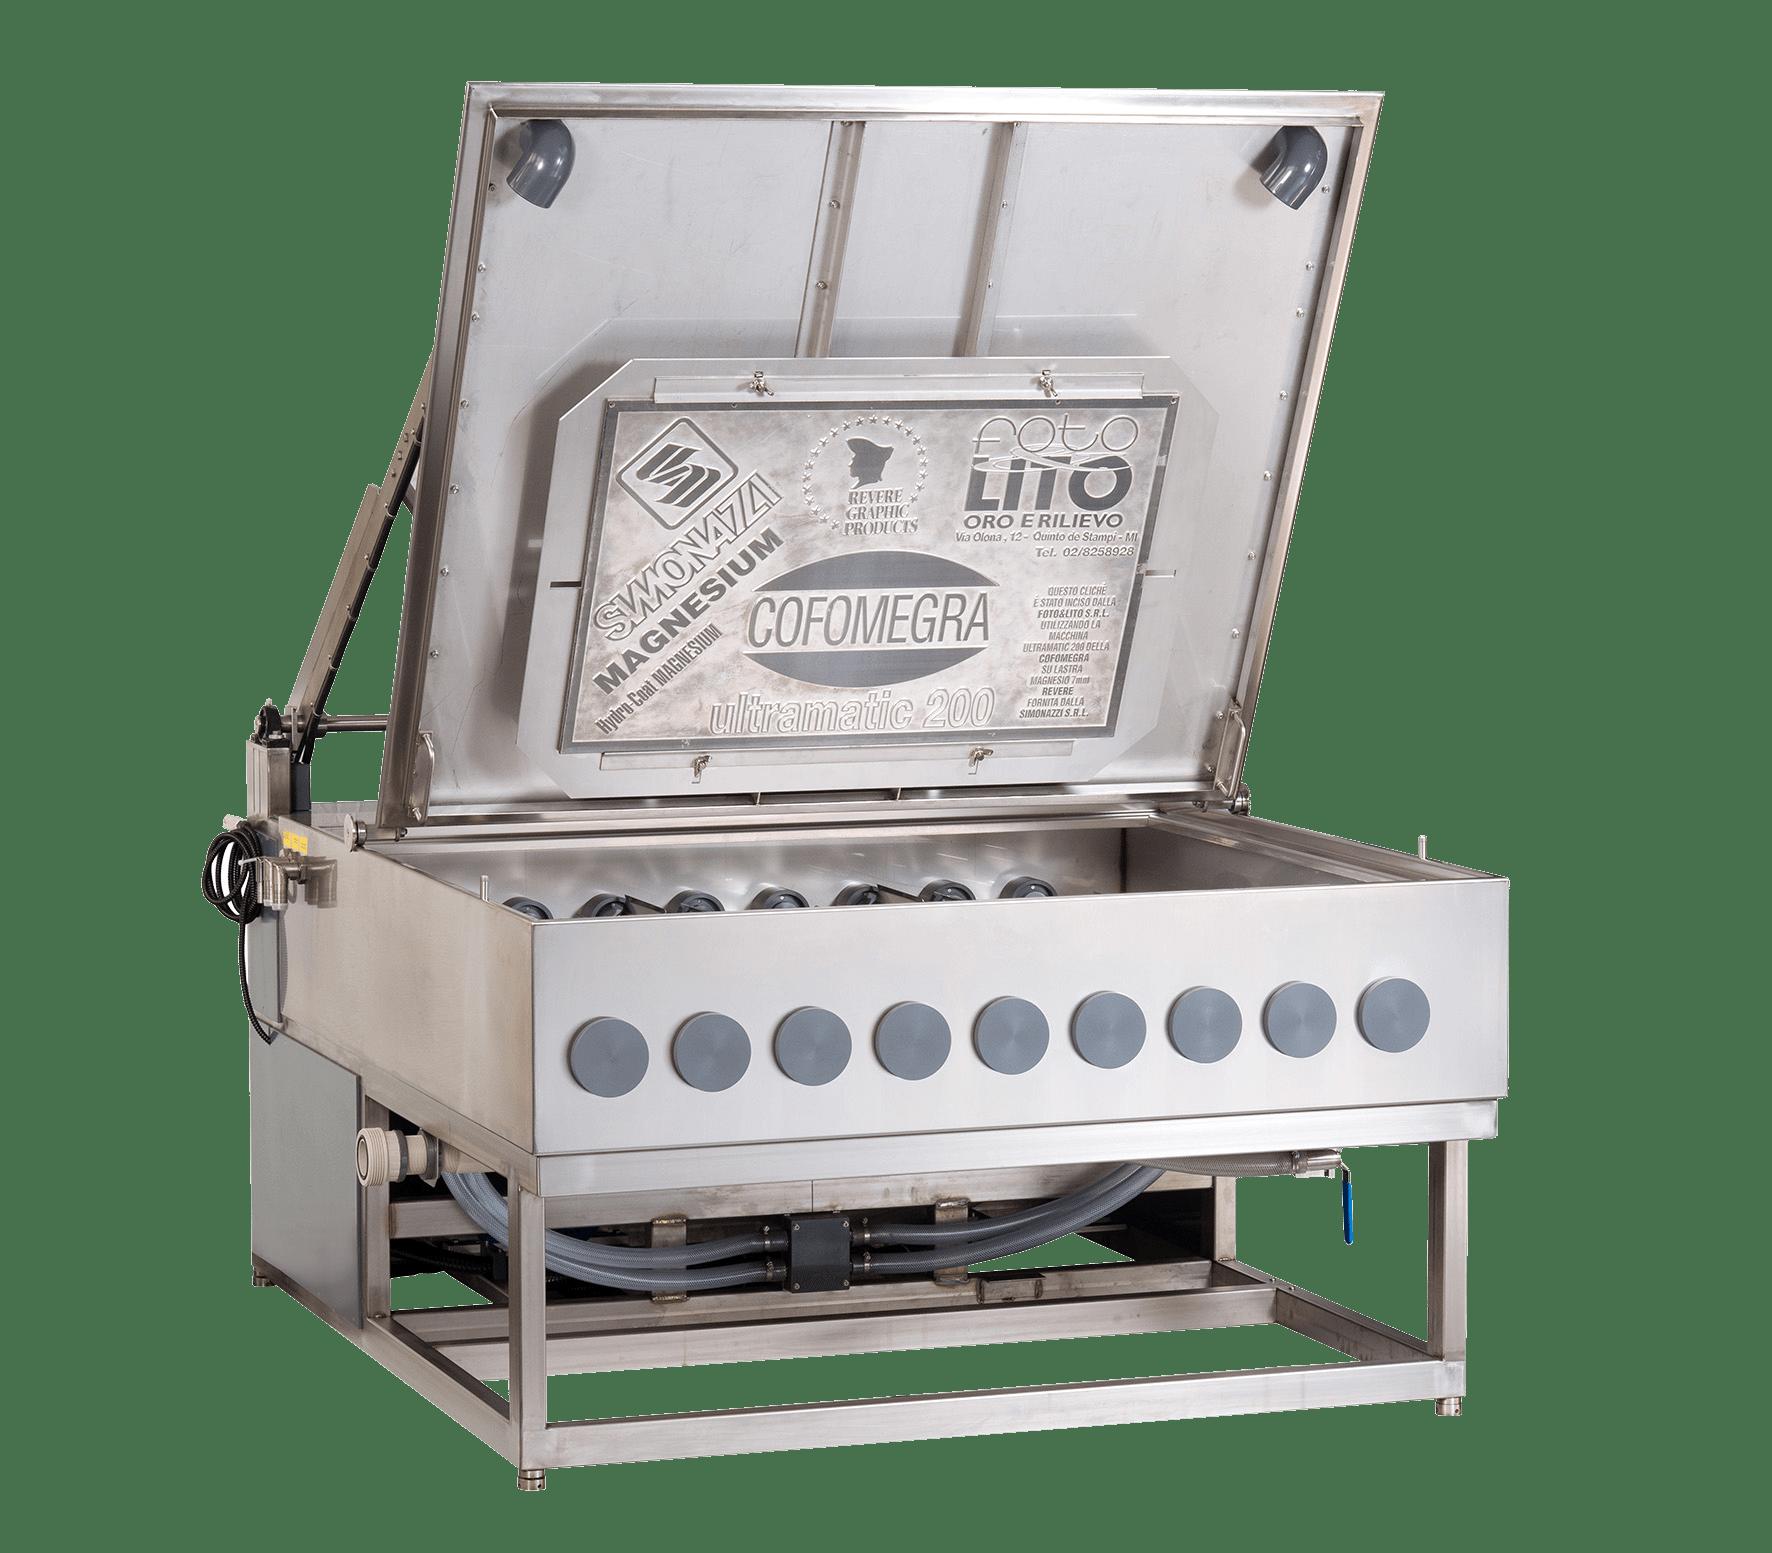 DIES ETCHING MACHINE – ULTRAMATIC 200 – 3